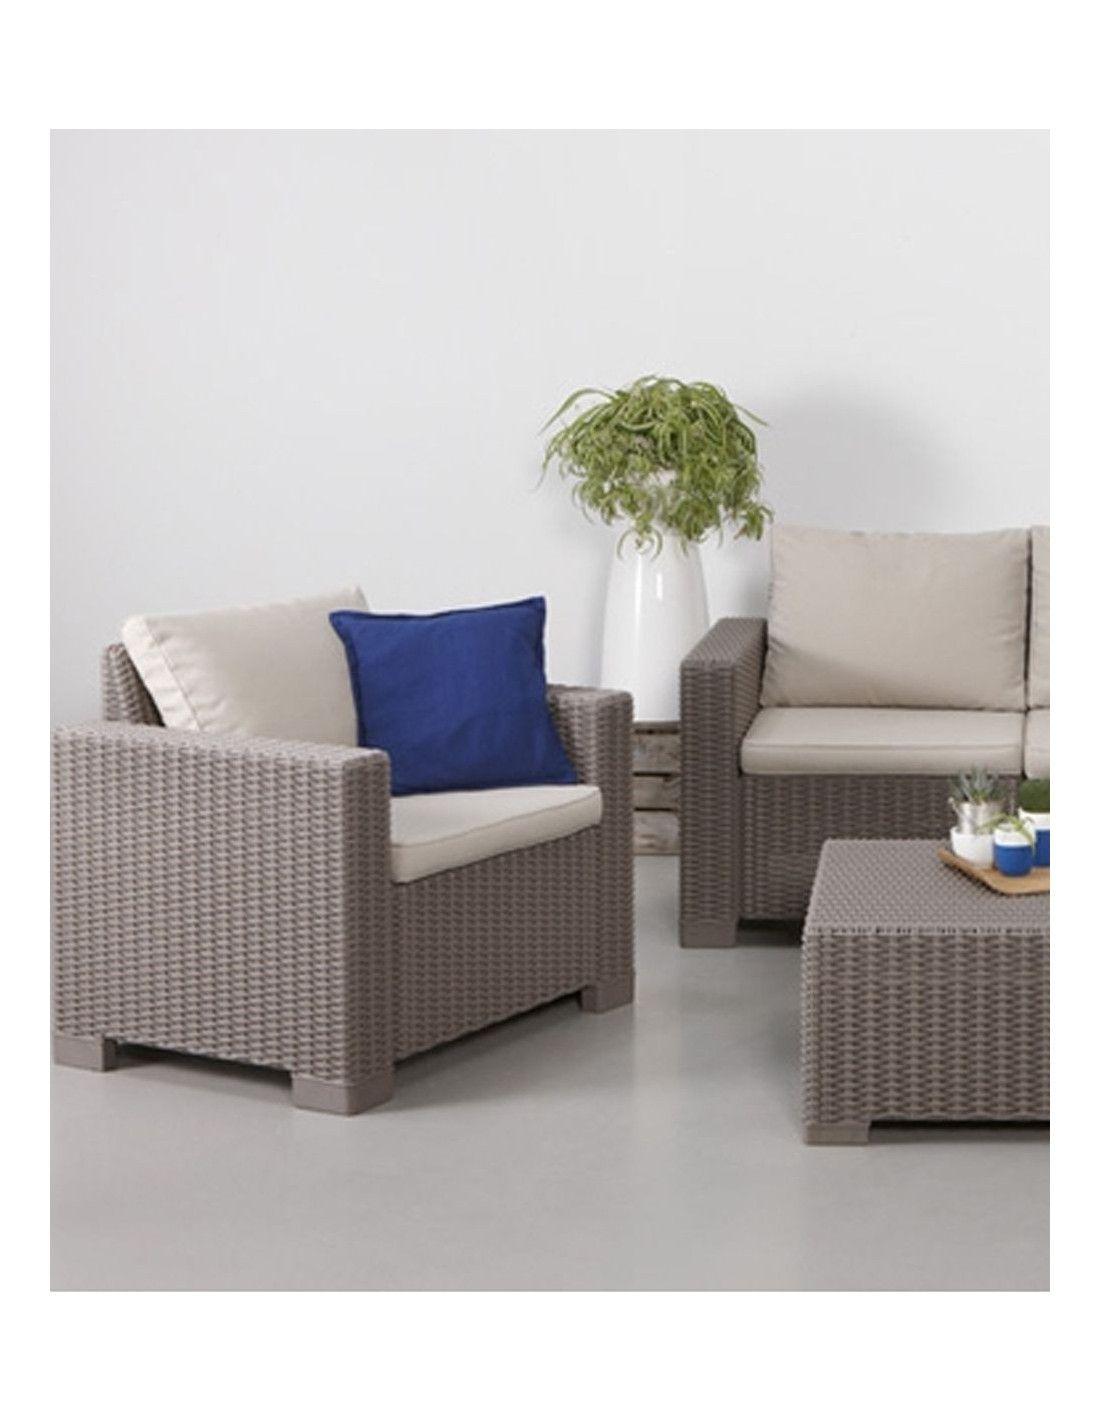 Set de muebles de jard n california 4 piezas marca curver for Muebles de jardin de resina